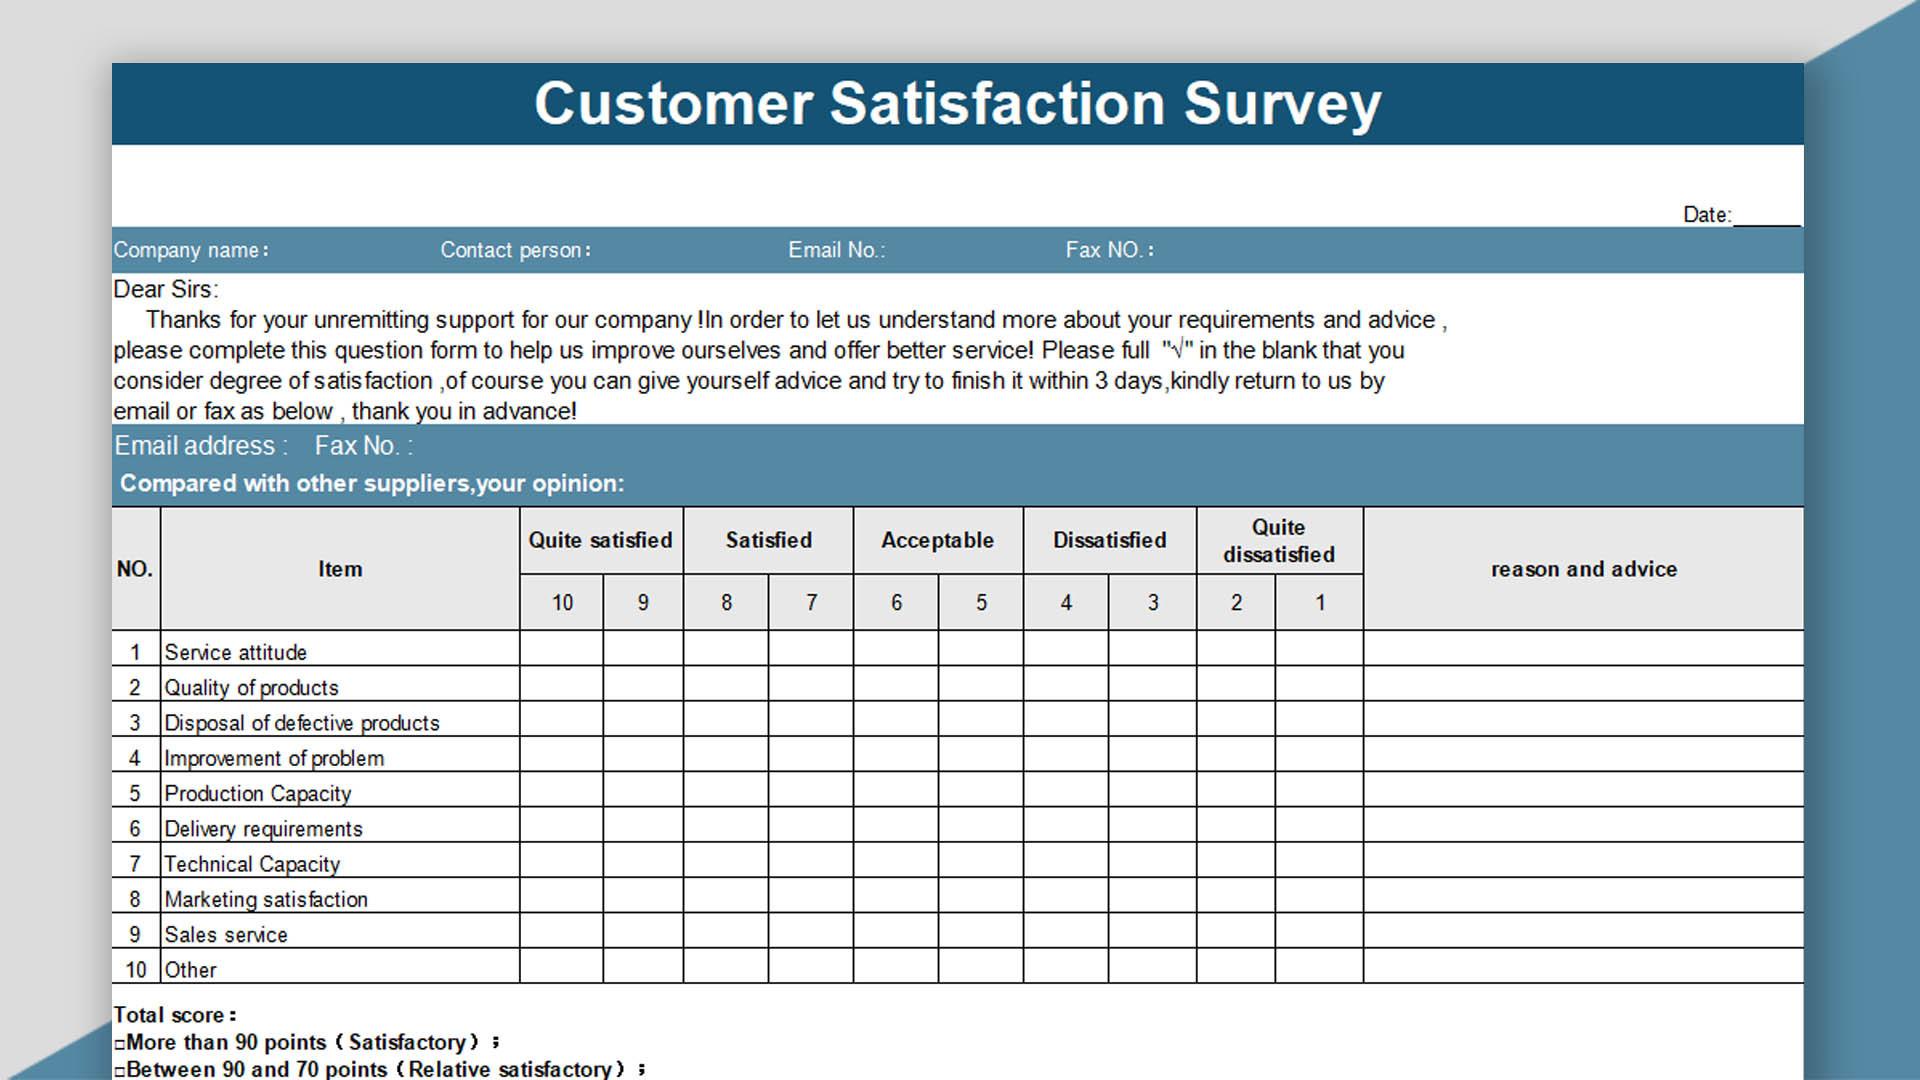 customer feedback form template xls WPS Template - Free Download Writer, Presentation & Spreadsheet